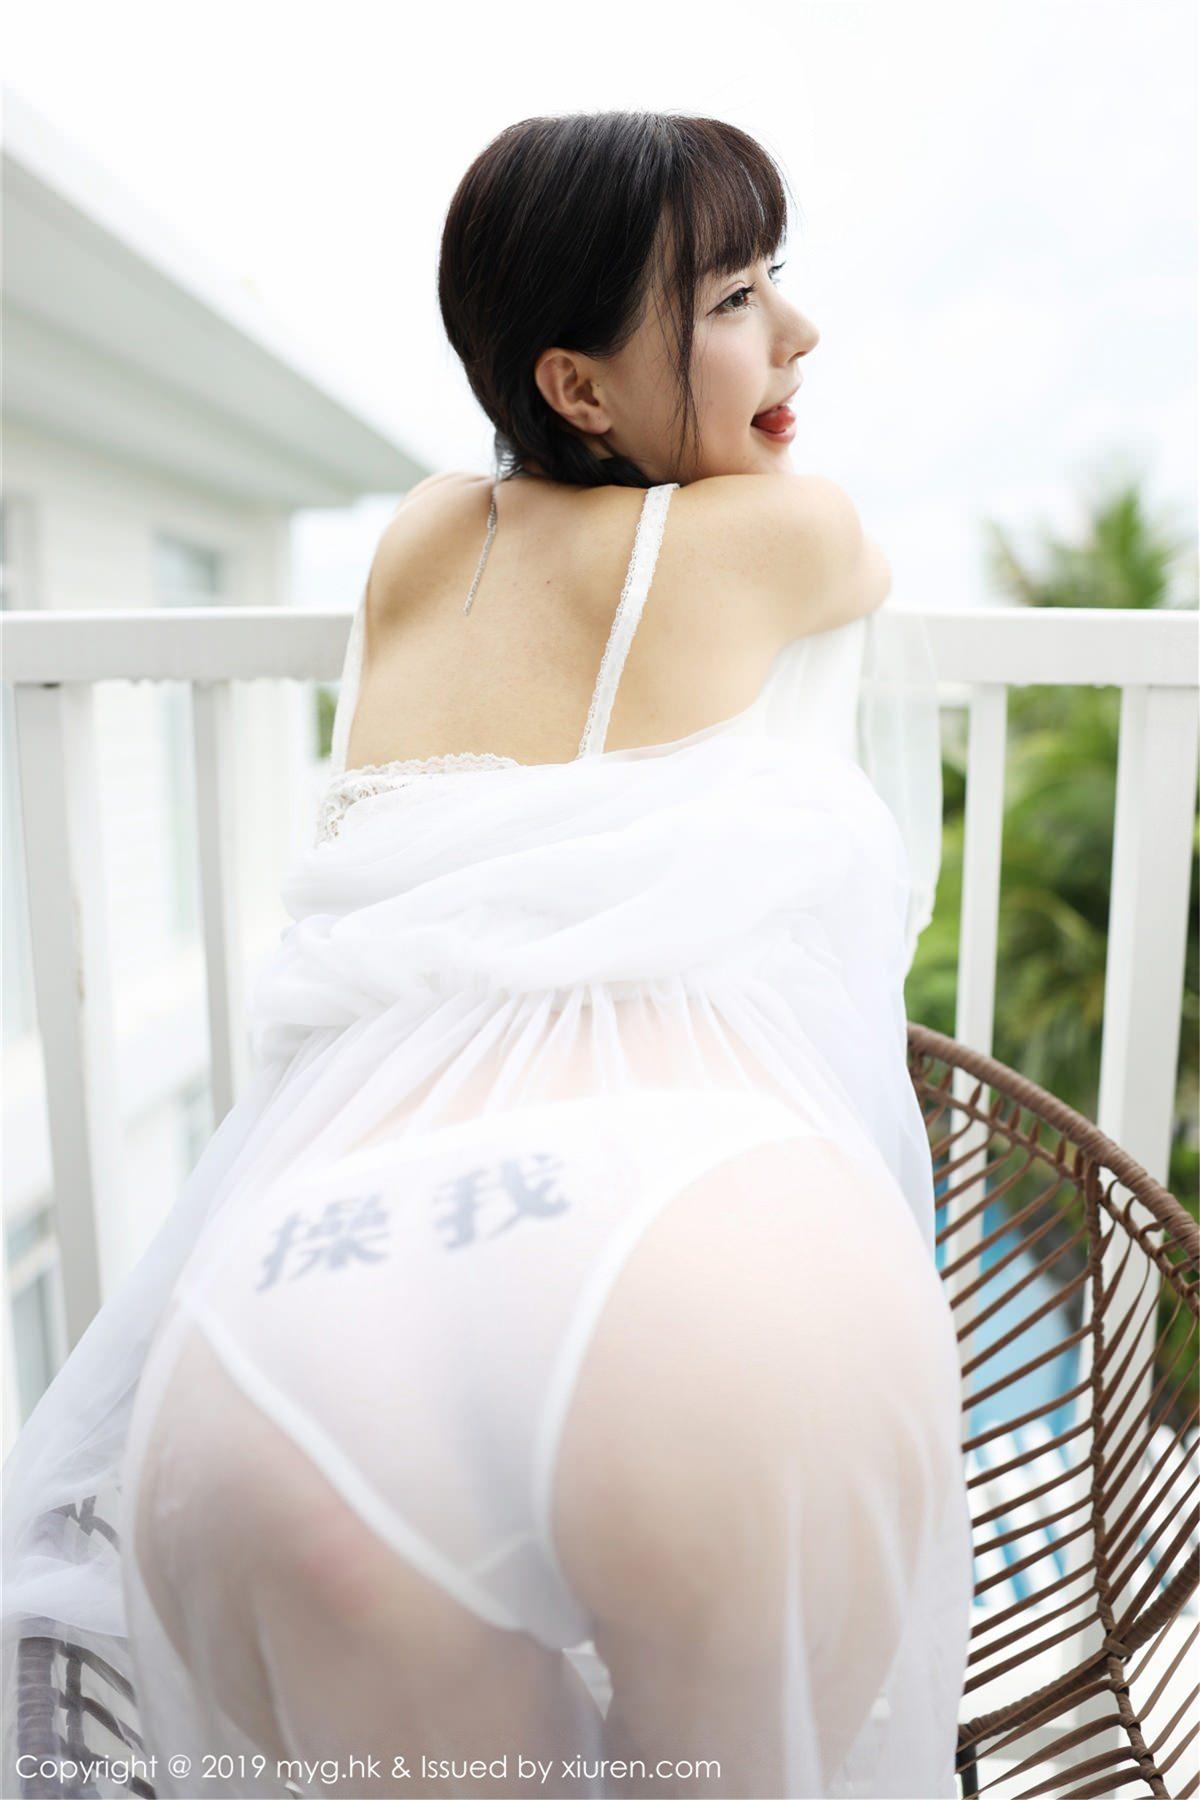 MyGirl Vol. 360 Zhu Ke Er